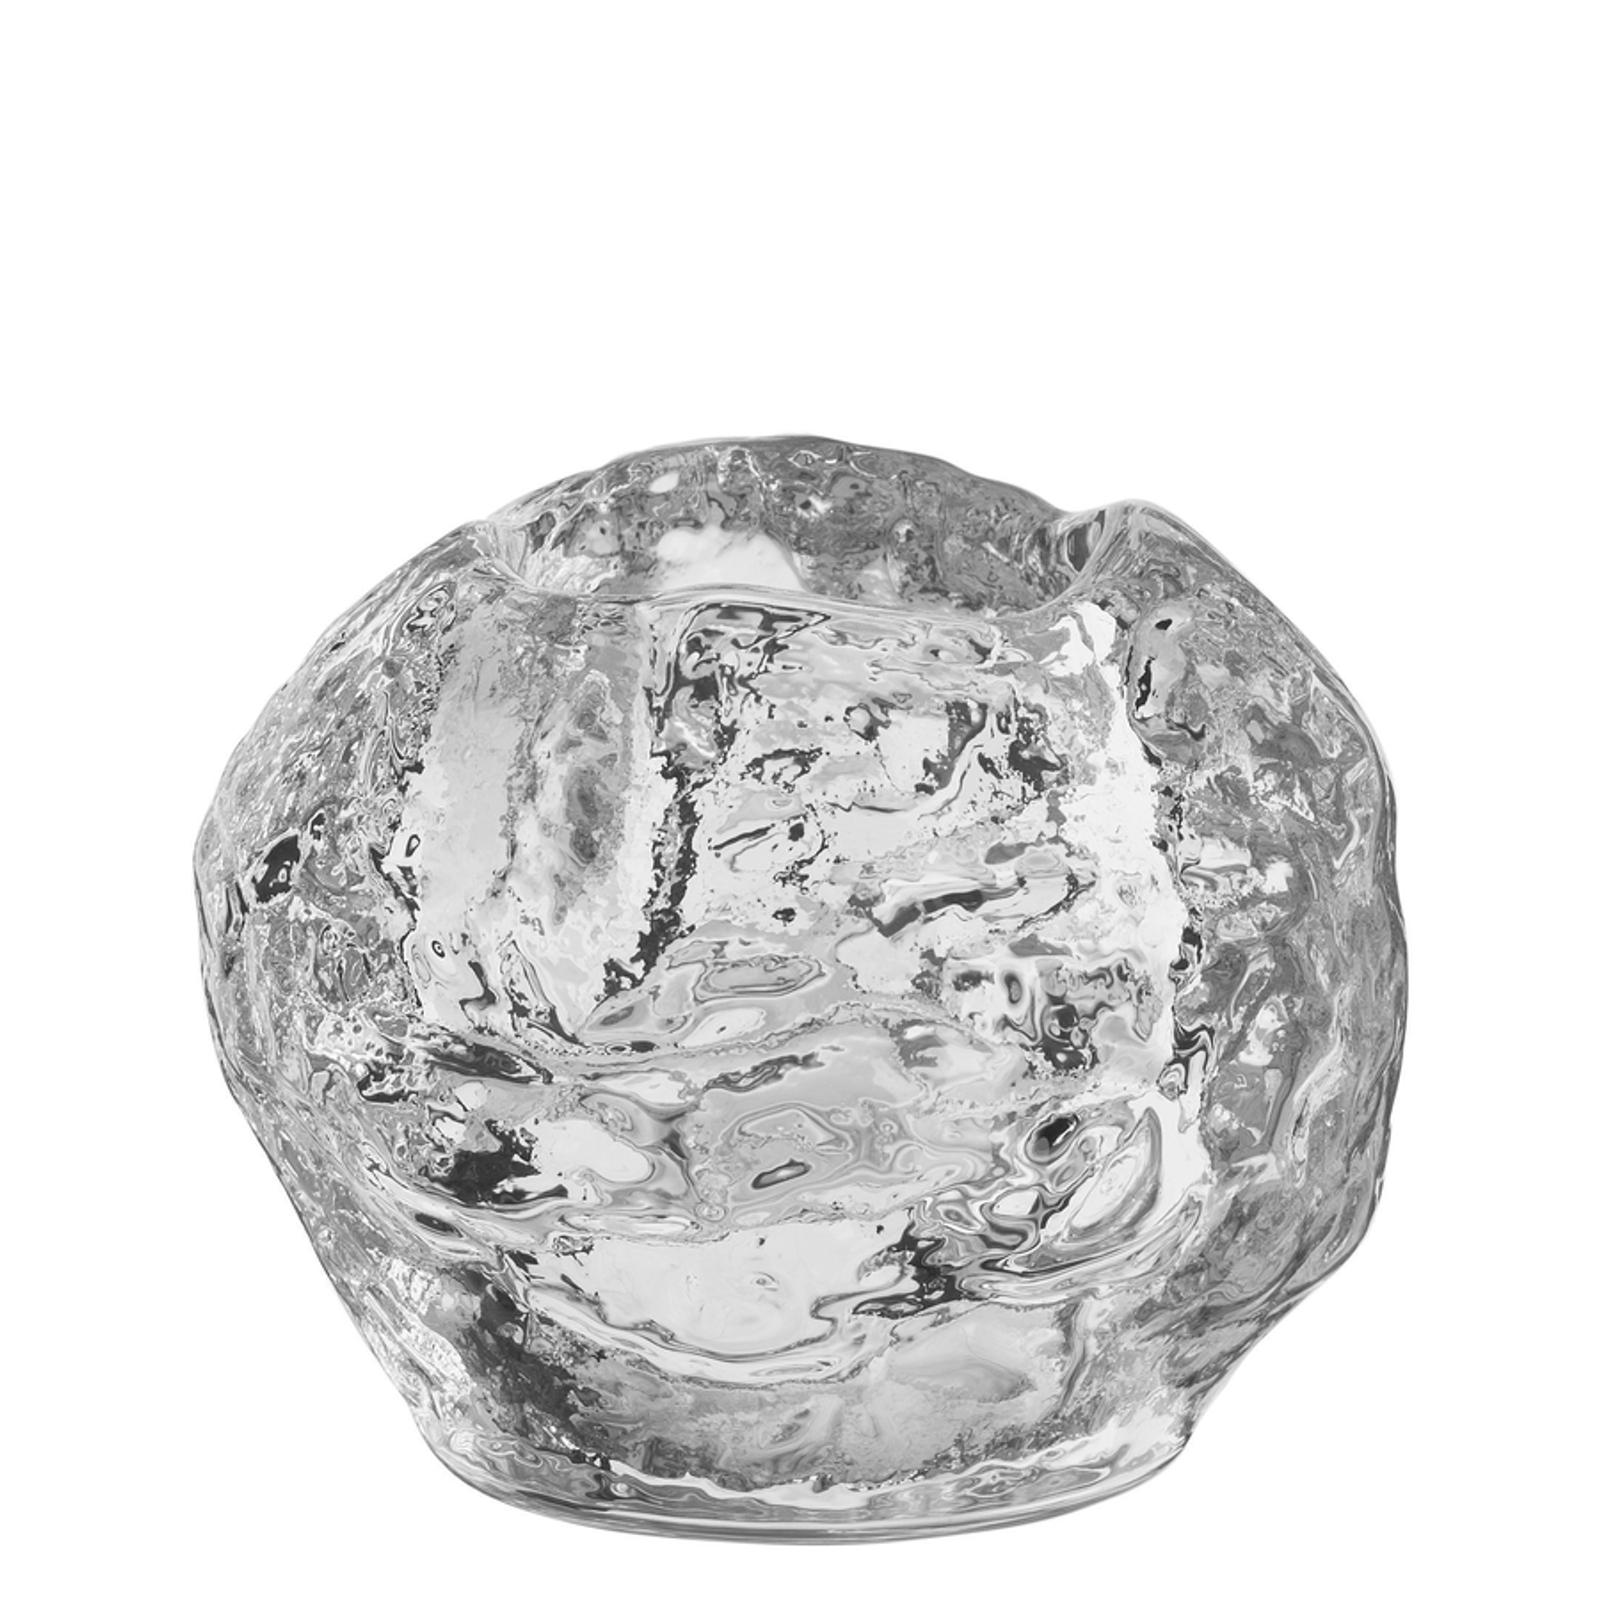 Kosta Boda Snowball Medium Votive   7067350